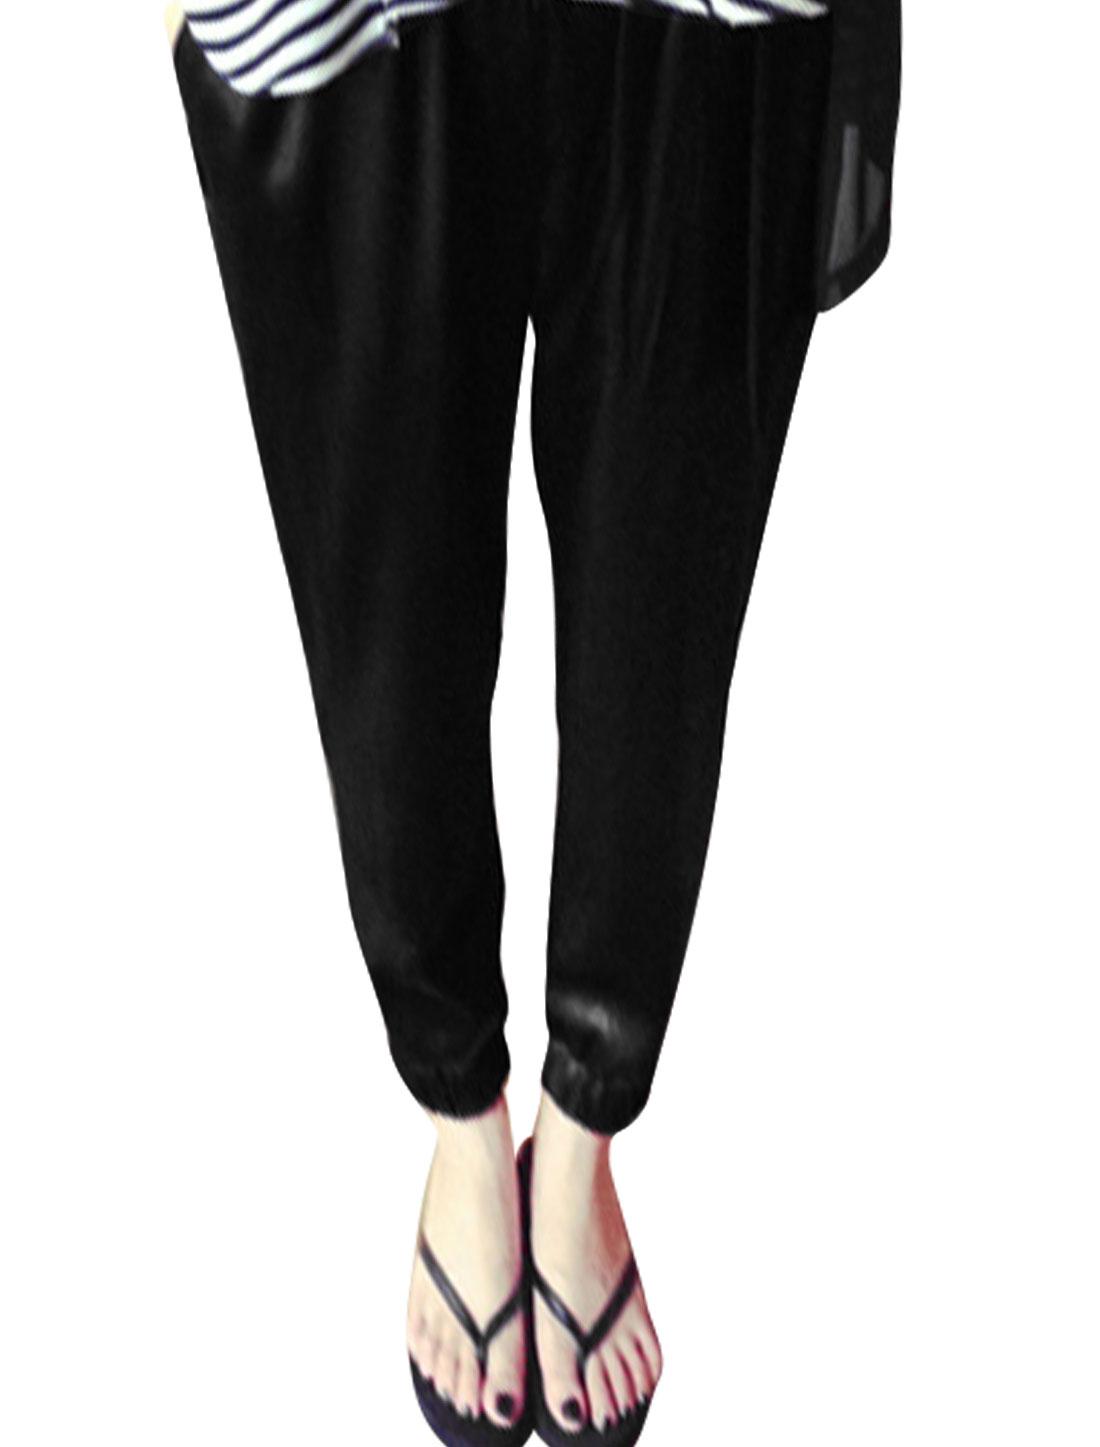 Women Leisrue Elastic Waist Tight Cuffs Cropped Pants Black XS